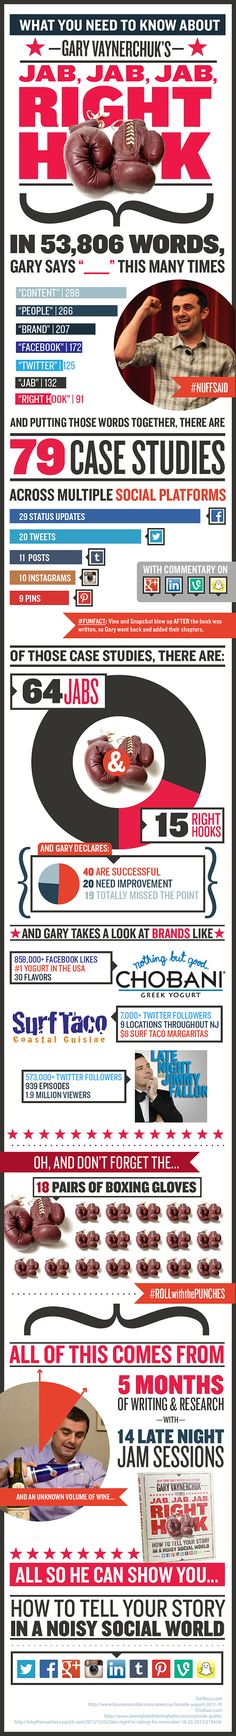 Infographic about Gary Vaynerchuk's book Jab, Jab, Jab, Right Hook.. #jjjrh cloud media, social media marketing, book worth, hooks, quot, media pros, new books, jab jab jab right hook